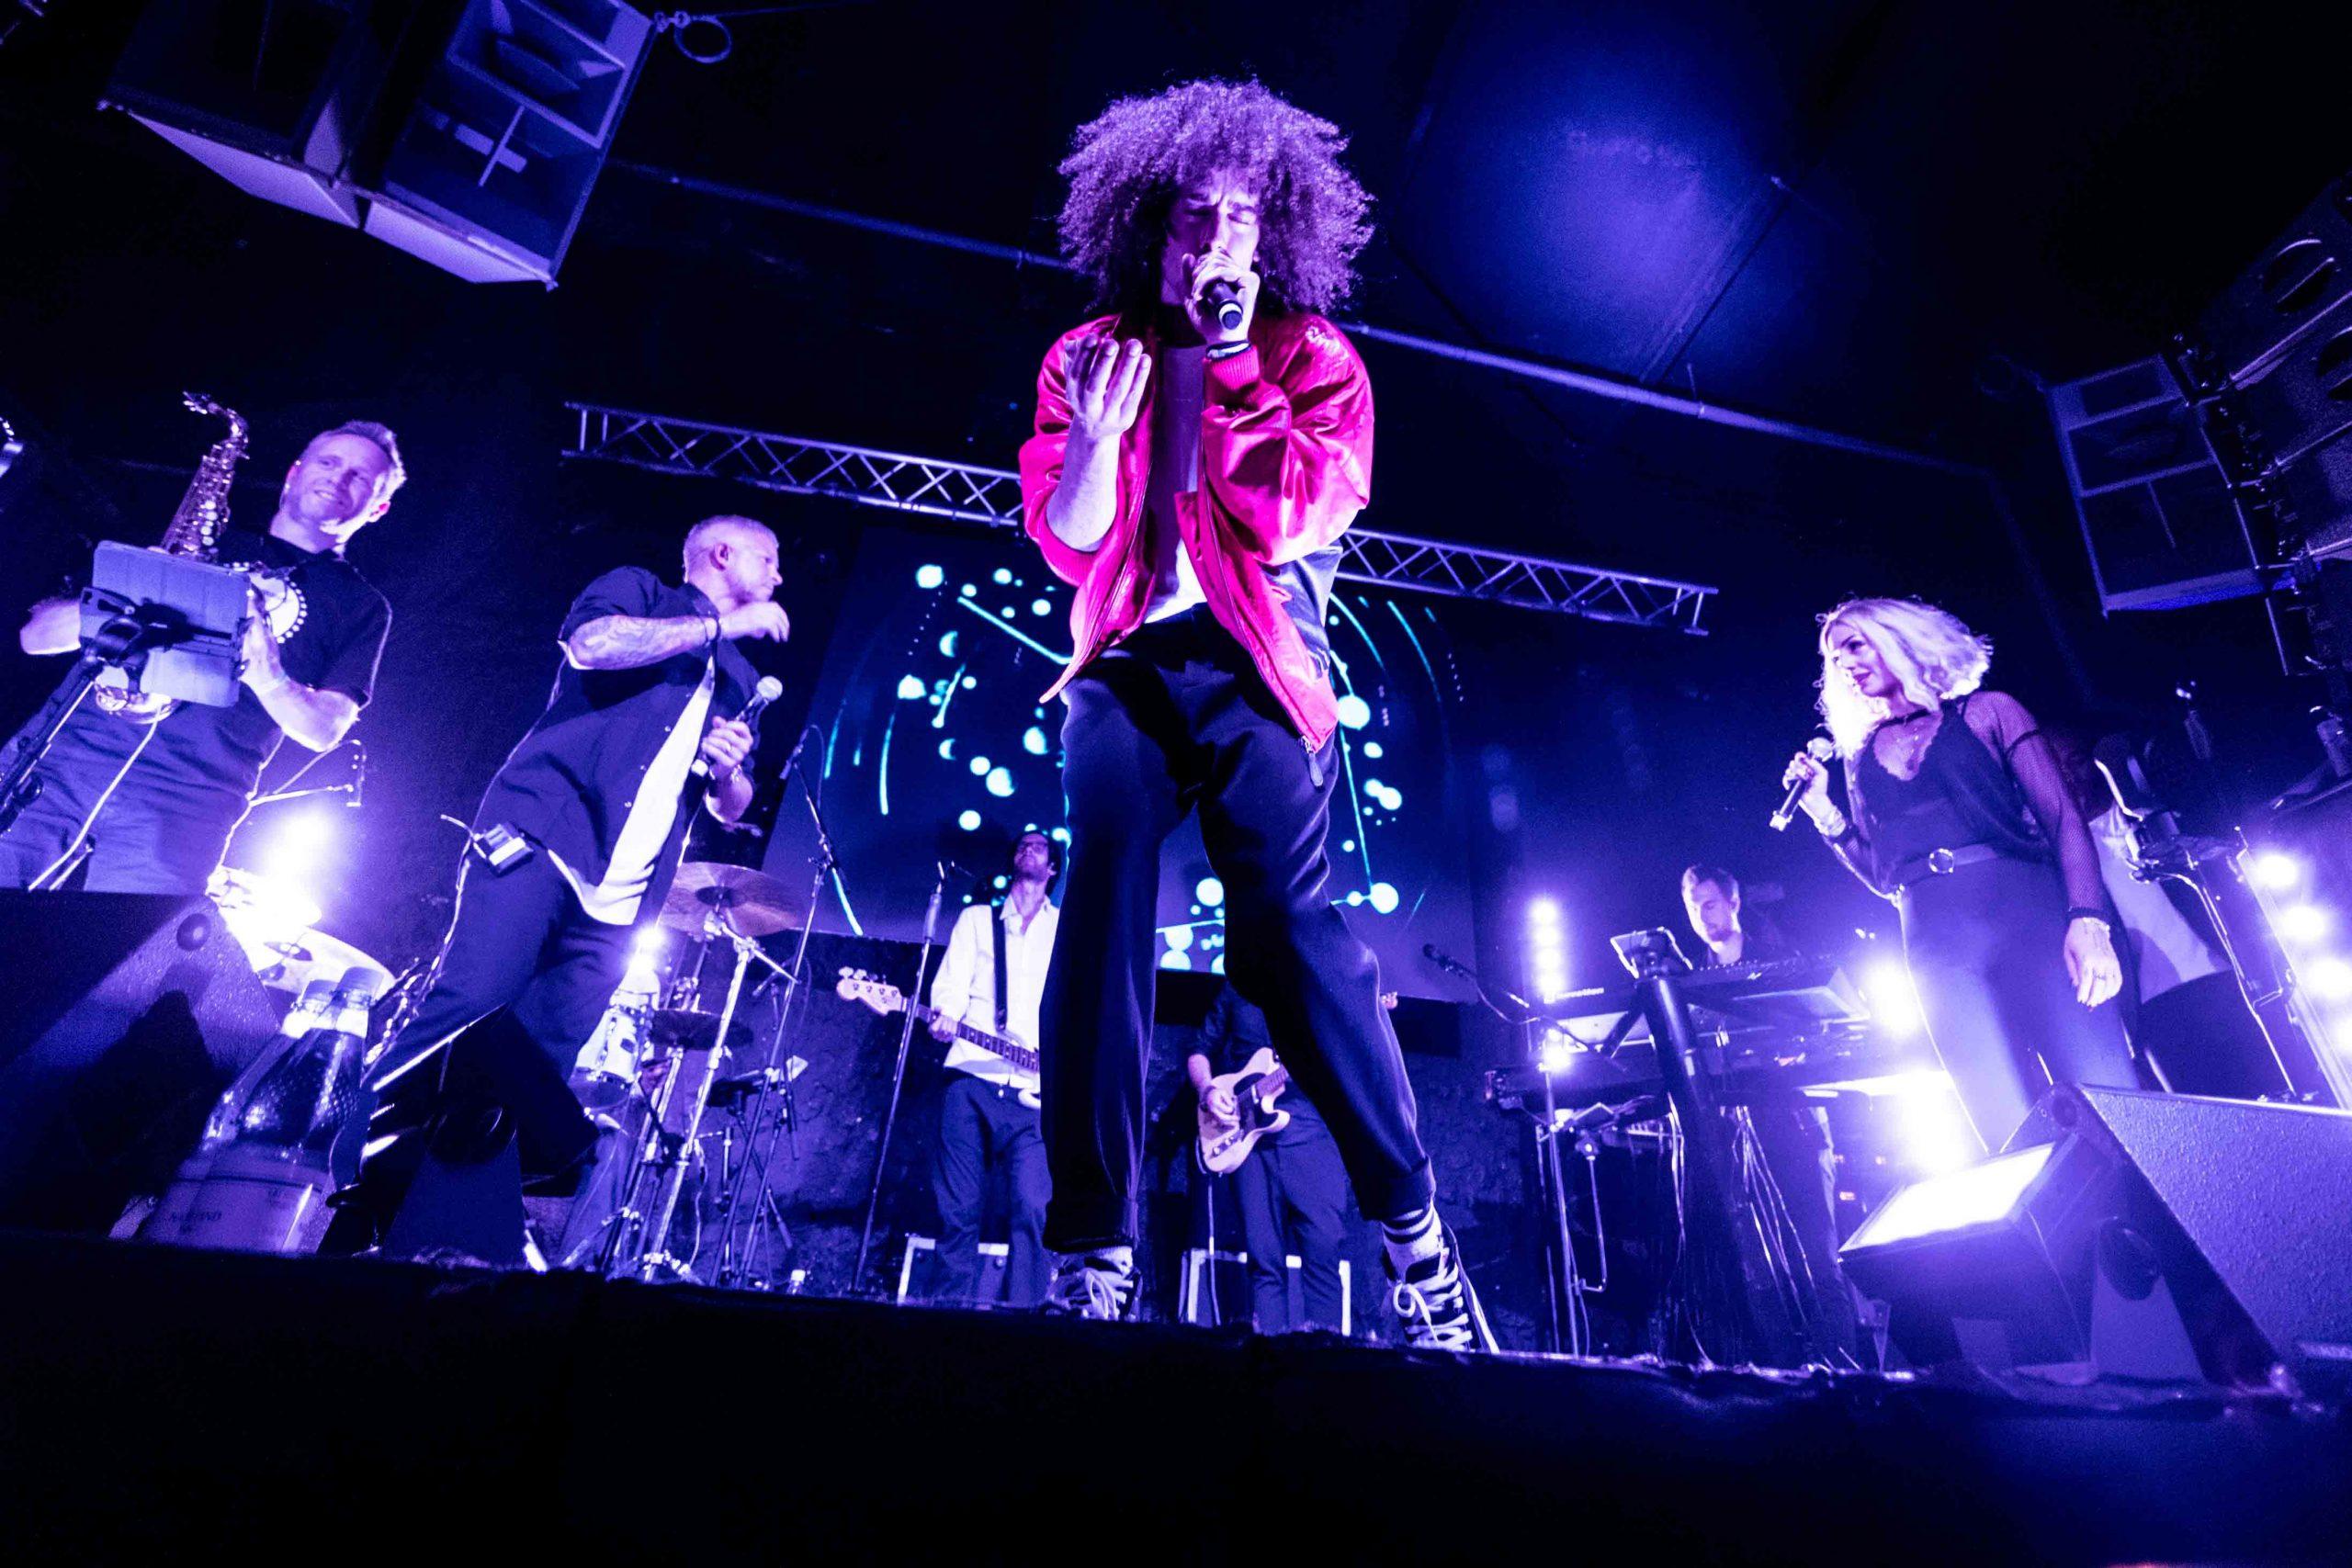 Fresh_Music_Live_Coverband_Media_28